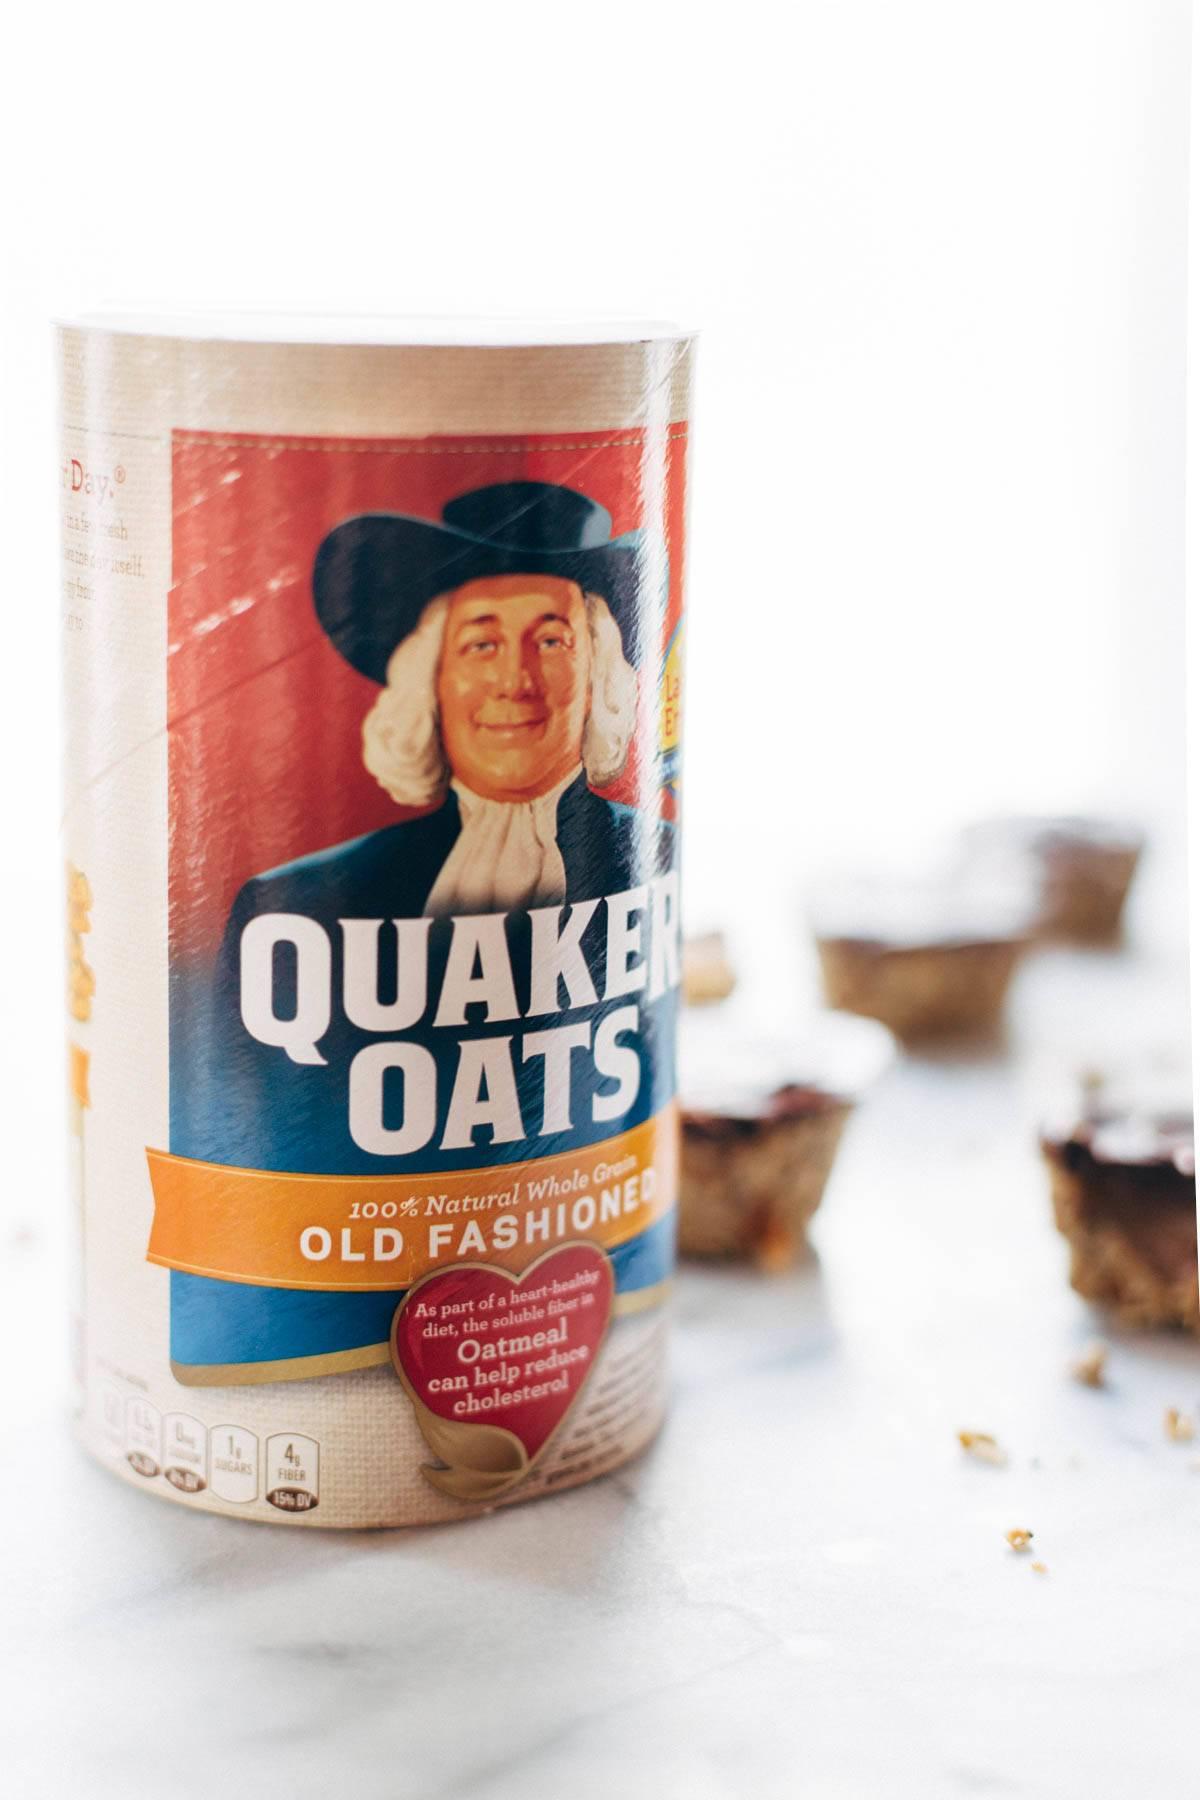 Old fashioned quaker oats.